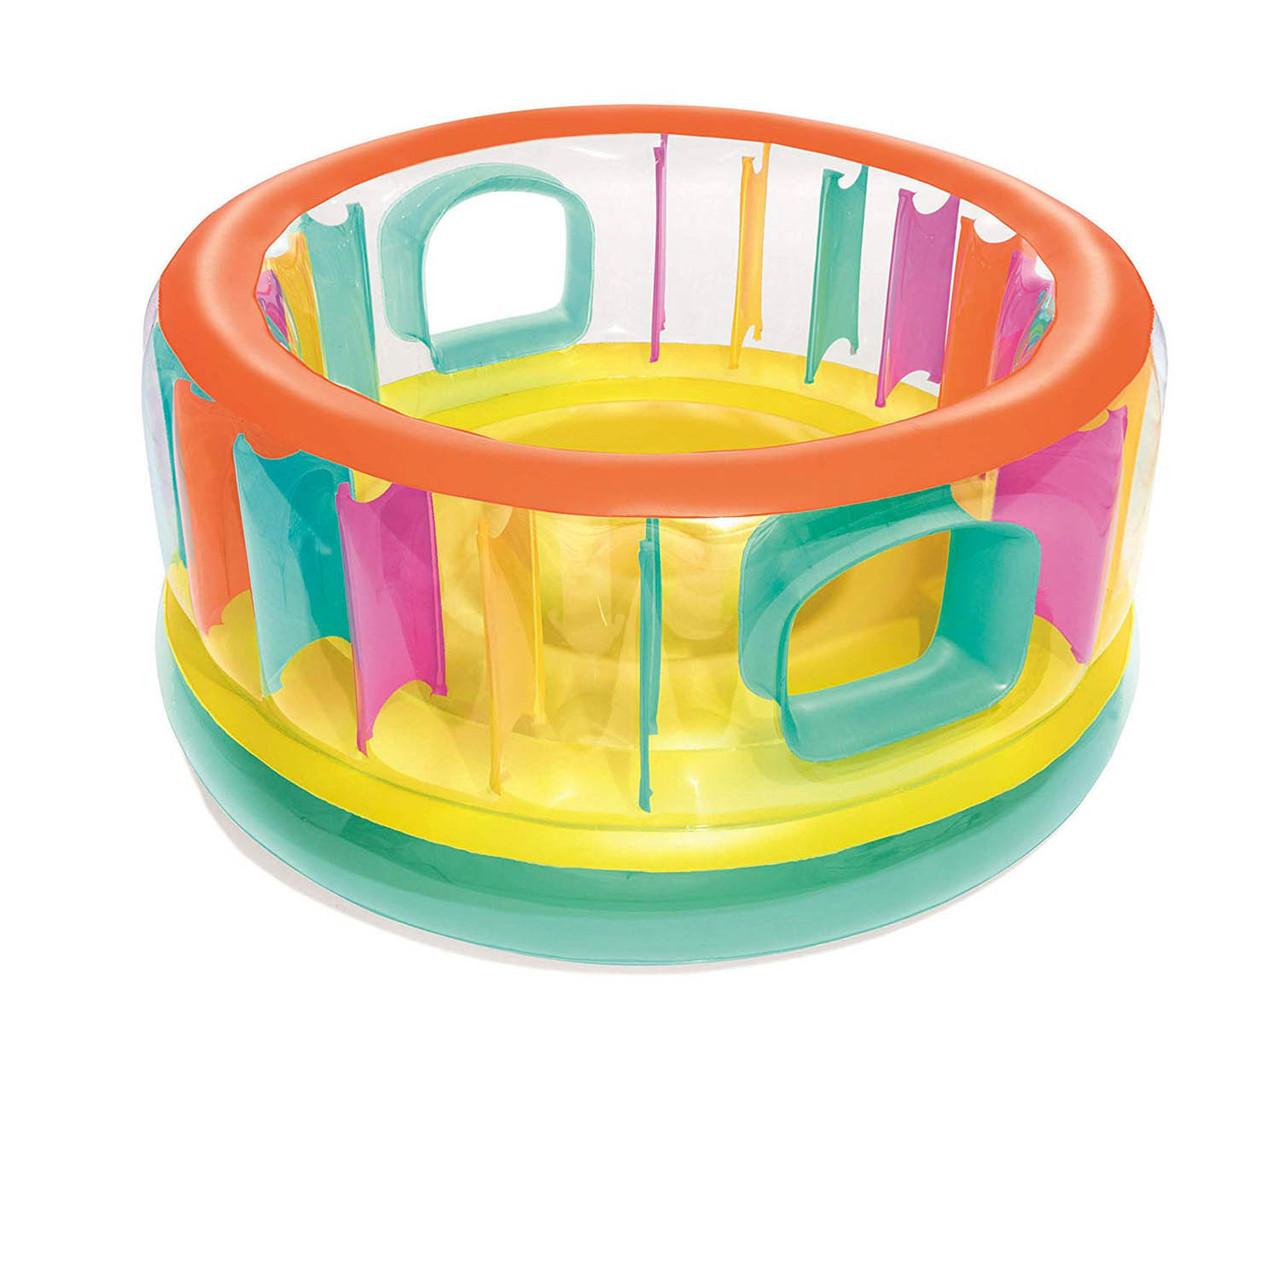 Надувной батут Bestway 52262 «Bounce Jam Bouncer», 180 х 86 см